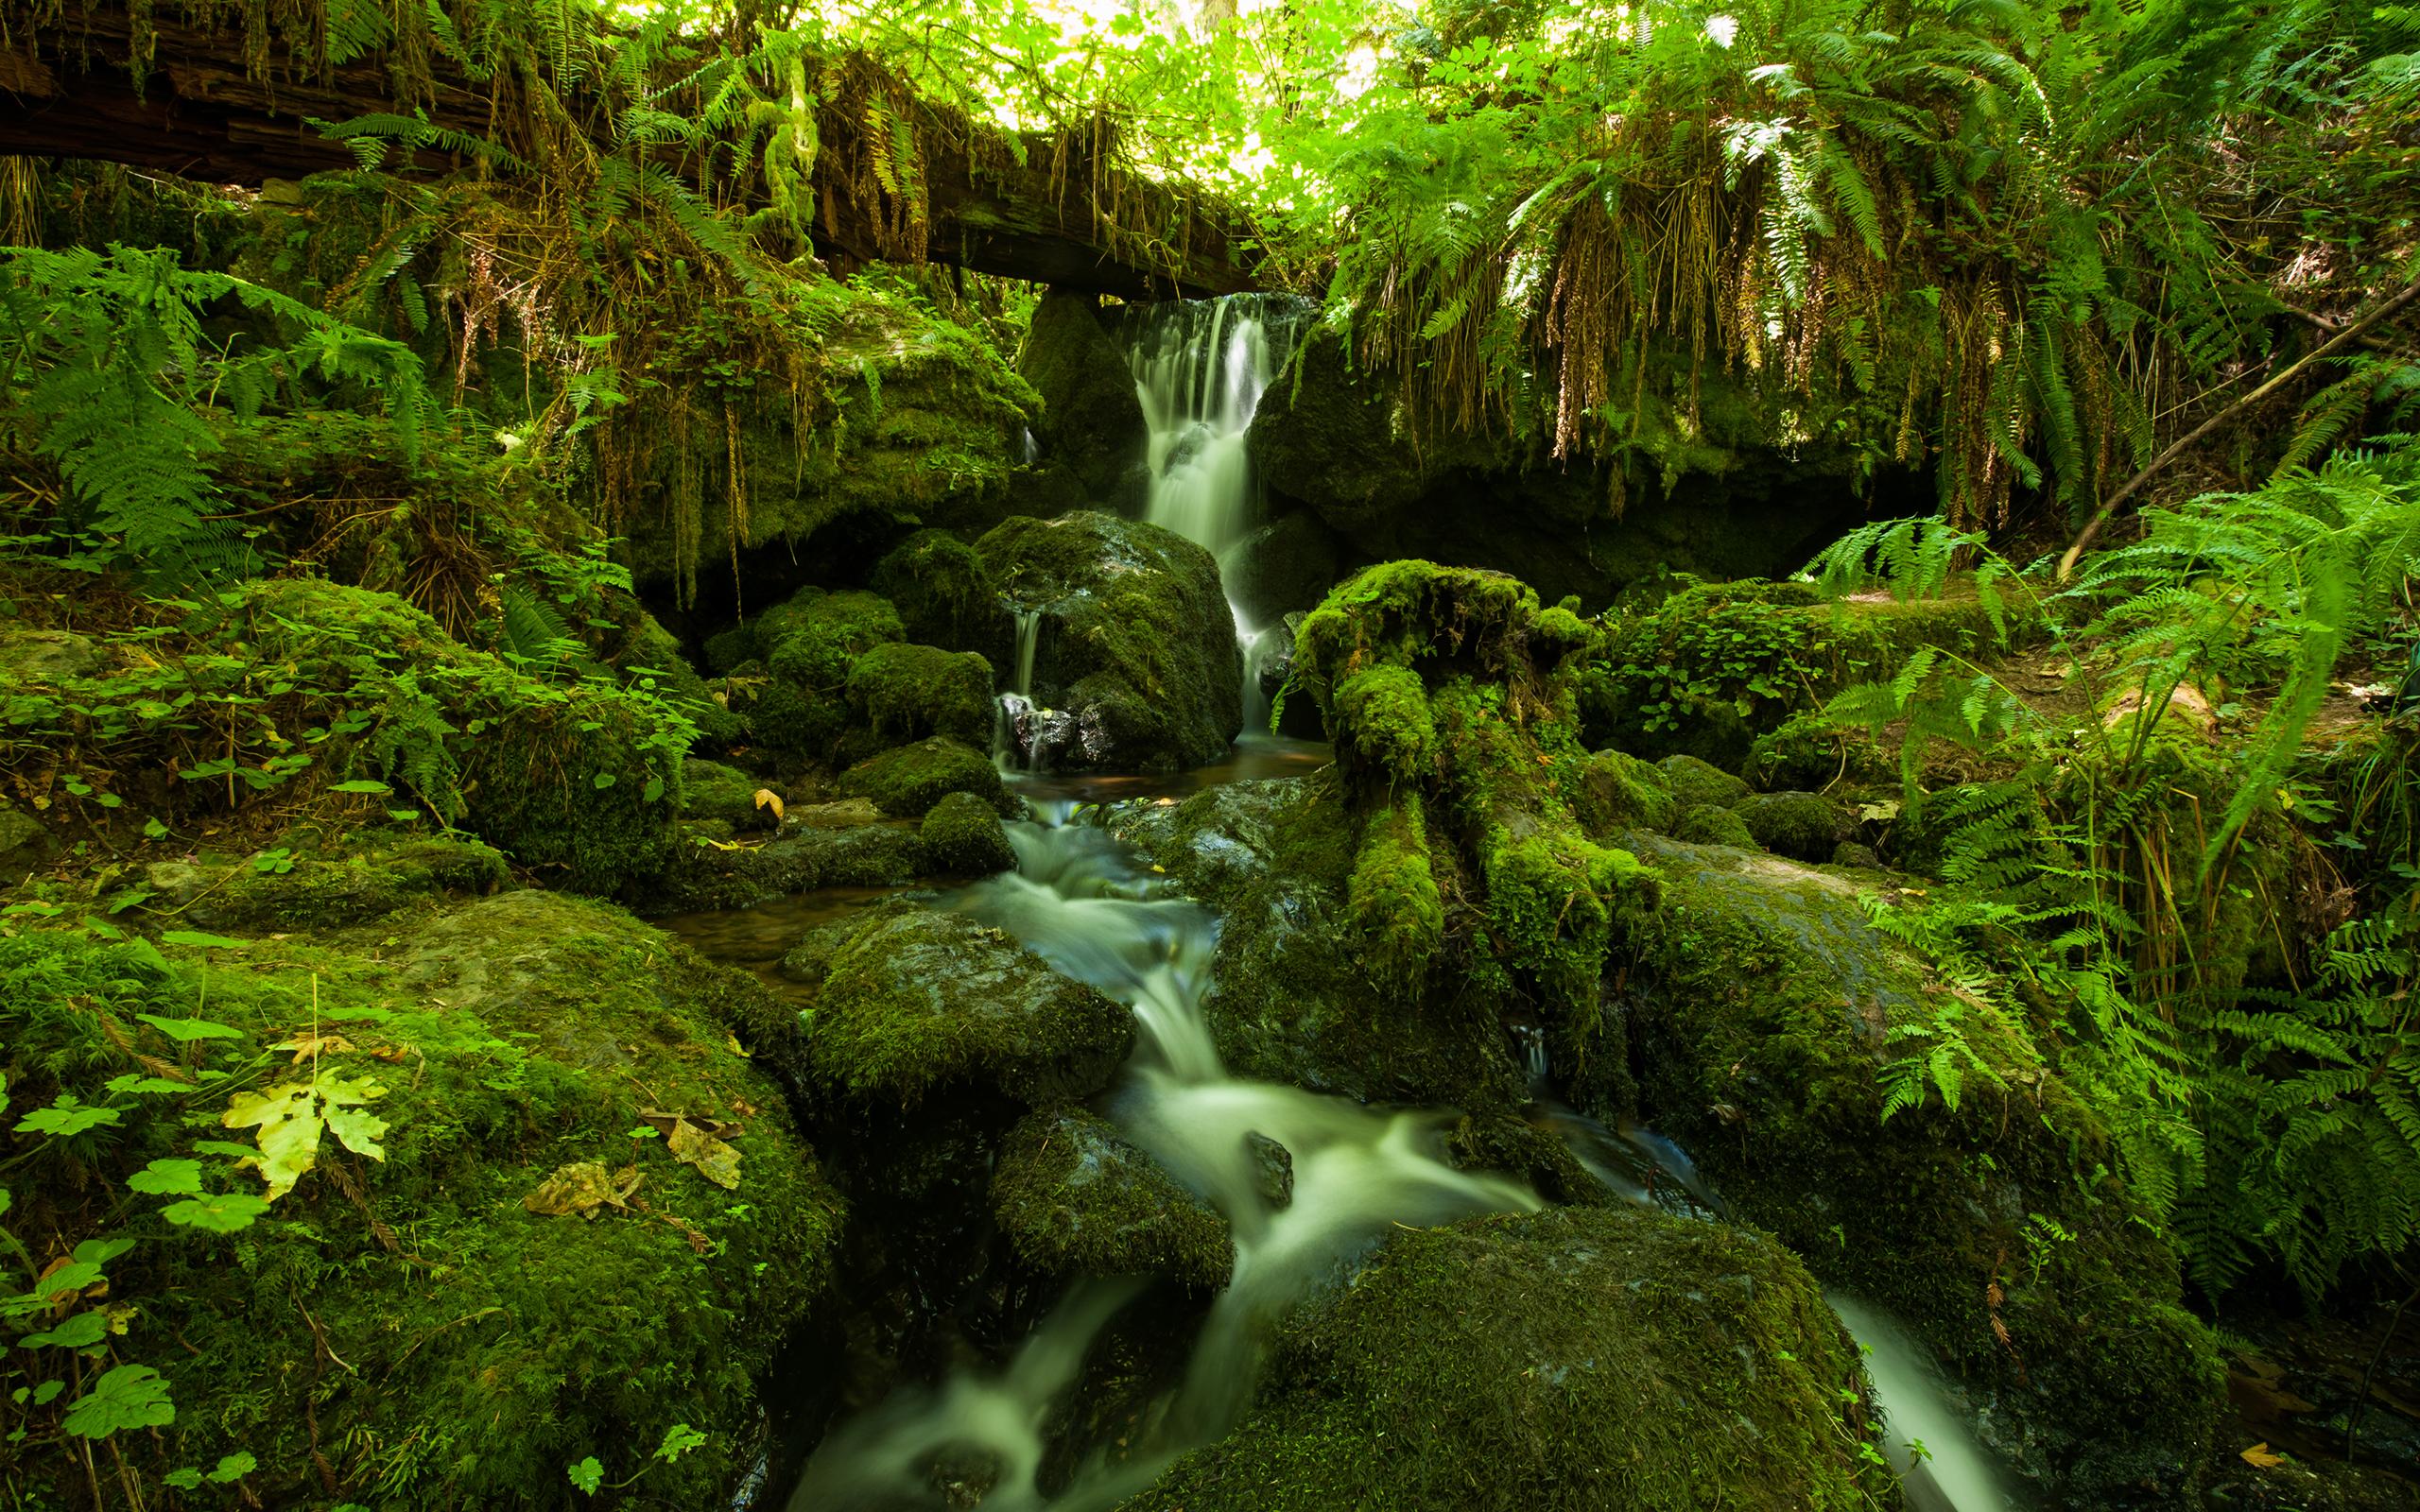 Forest Jungle Green Stream Timelapse Moss Fern Rocks ...